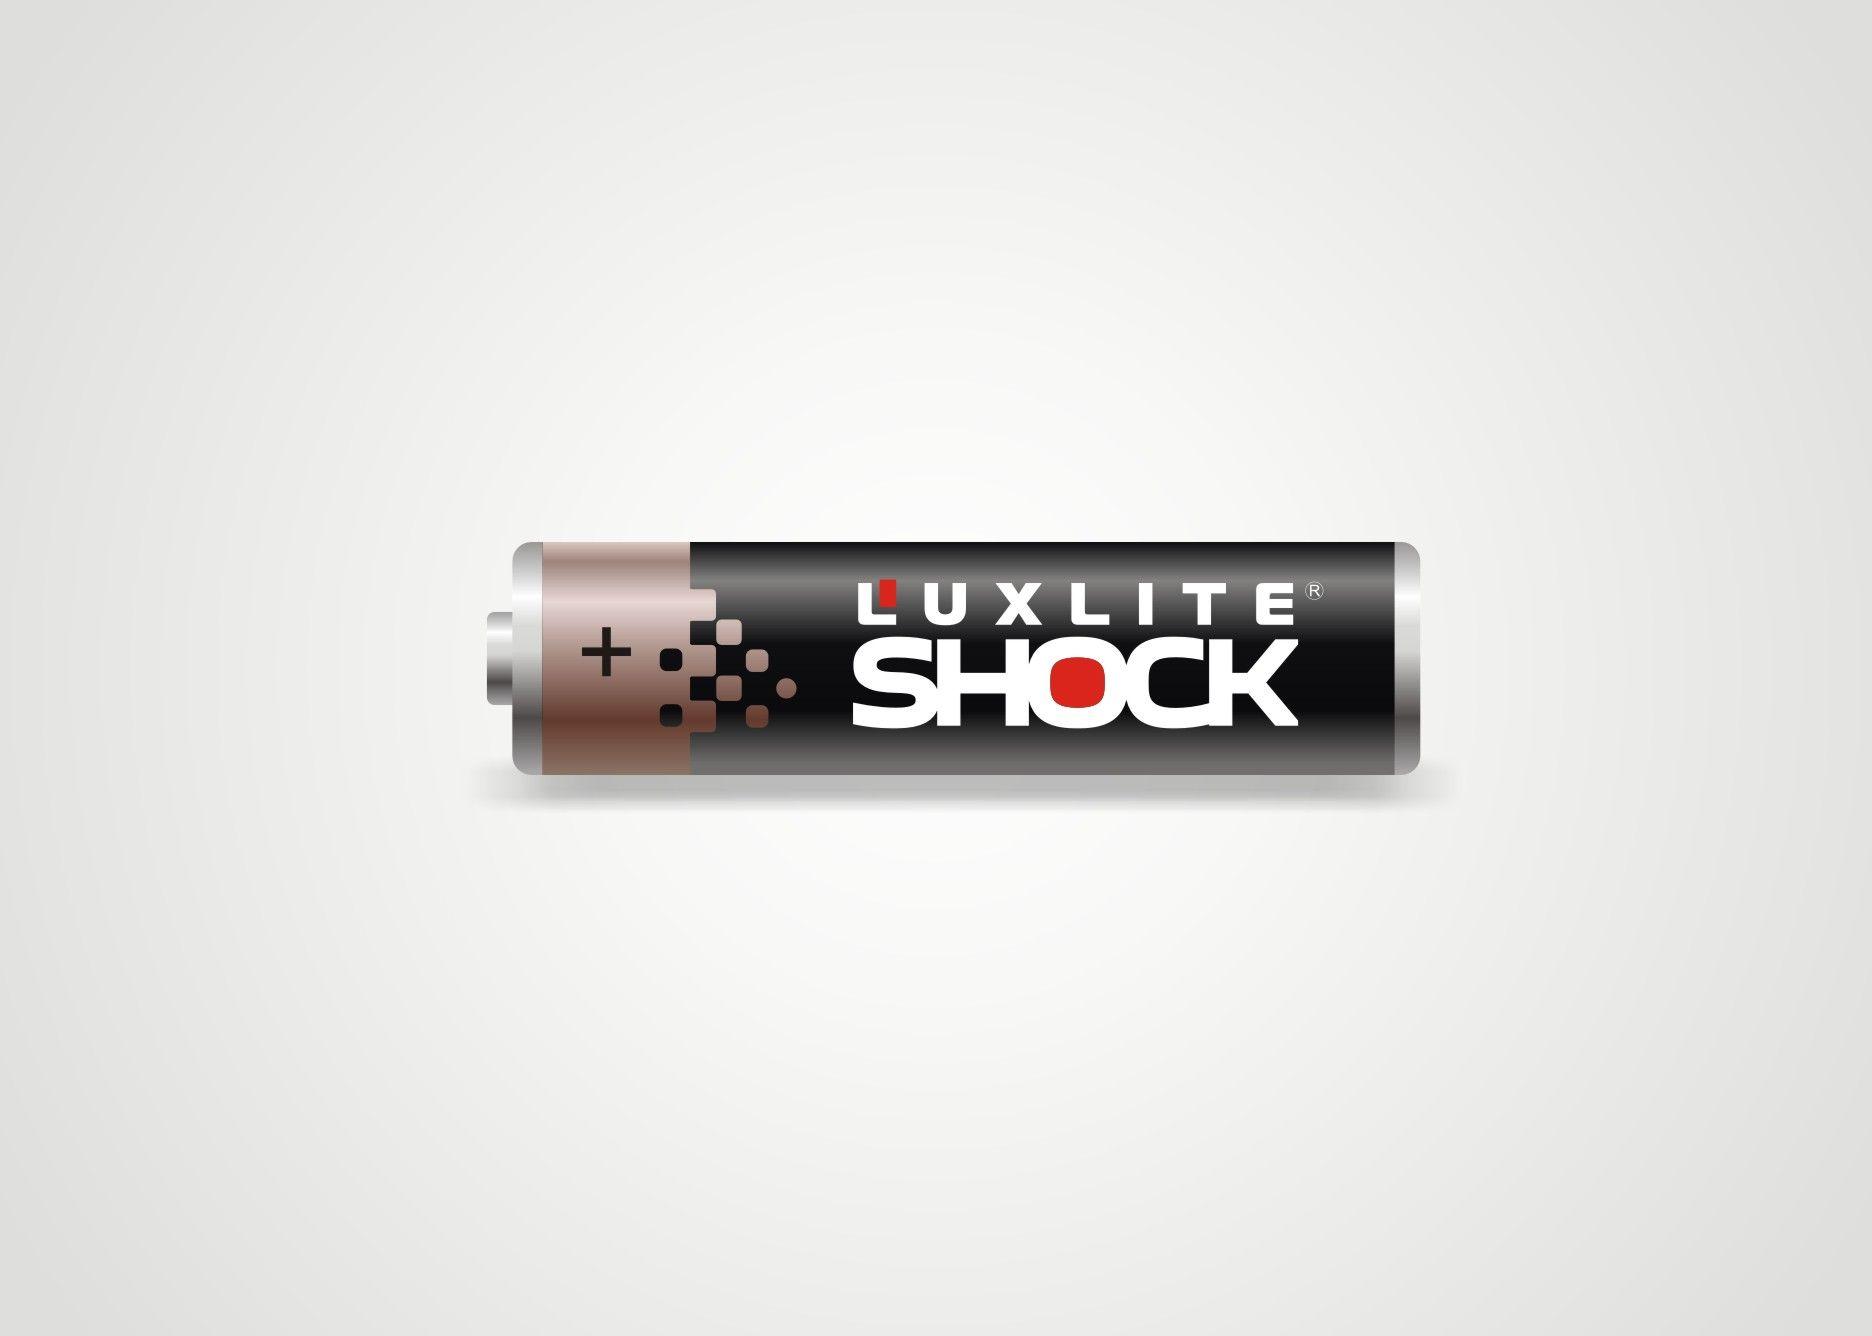 Логотип для батареек LUXLITE SHOCK - дизайнер Zheravin